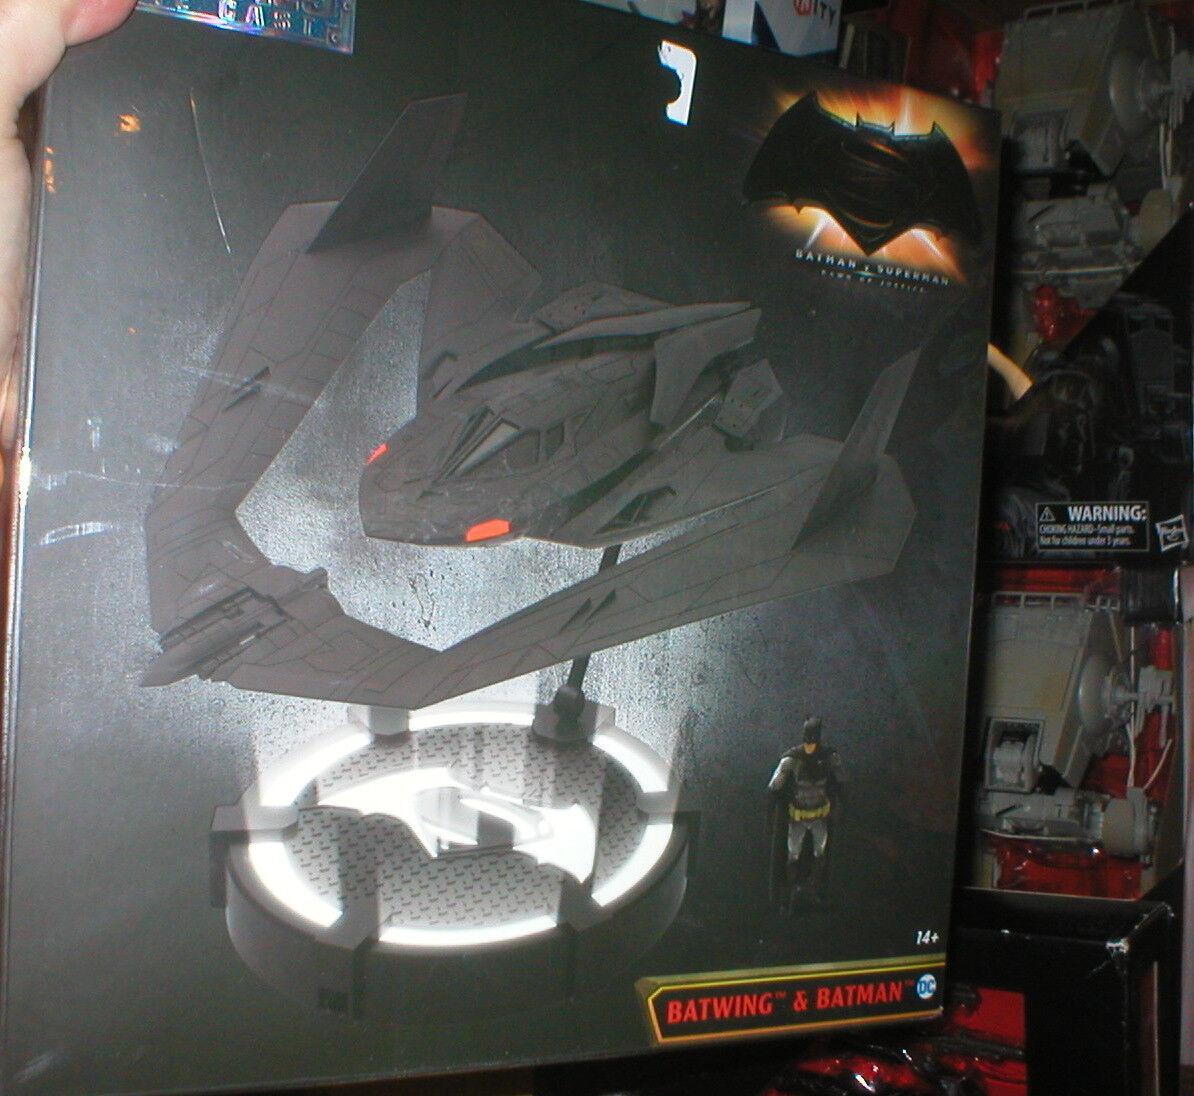 BATMAN VS. SUPERMAN DIE CAST METAL BATWING AND BATMAN, SEALED, NEVER OPENED